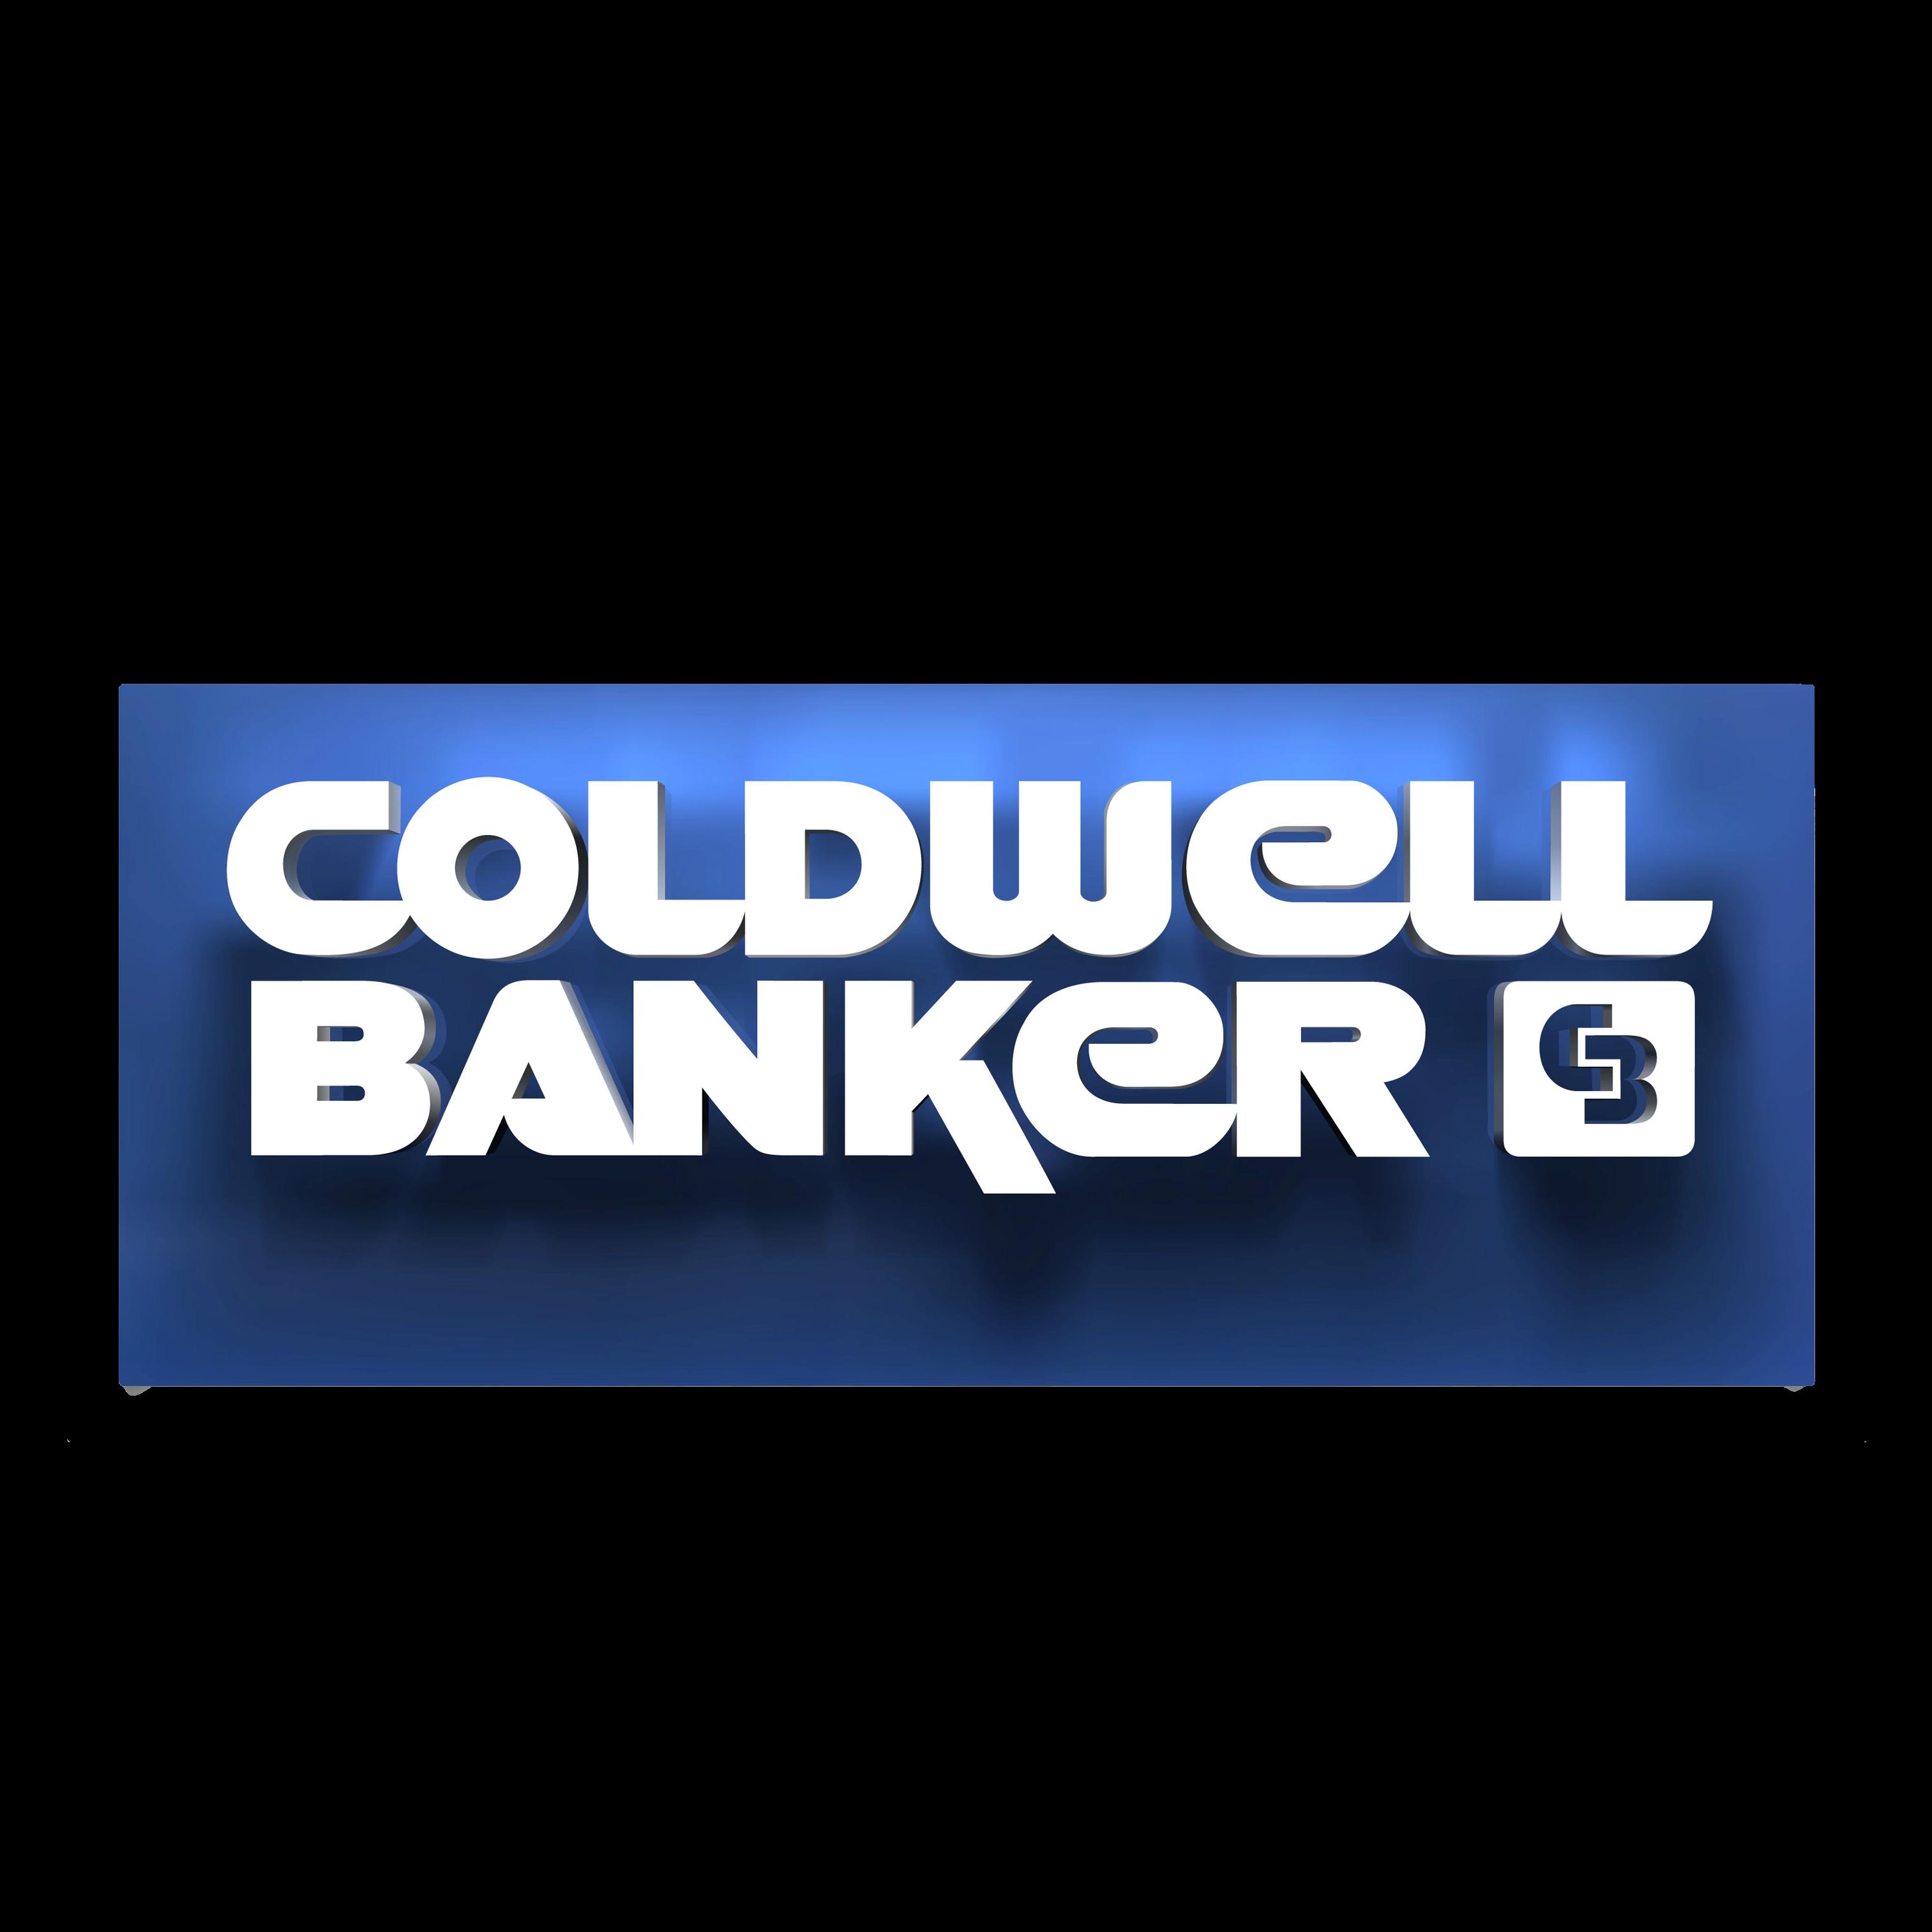 Tricia Buckner, Starkville Home Team of Coldwell Banker SRE